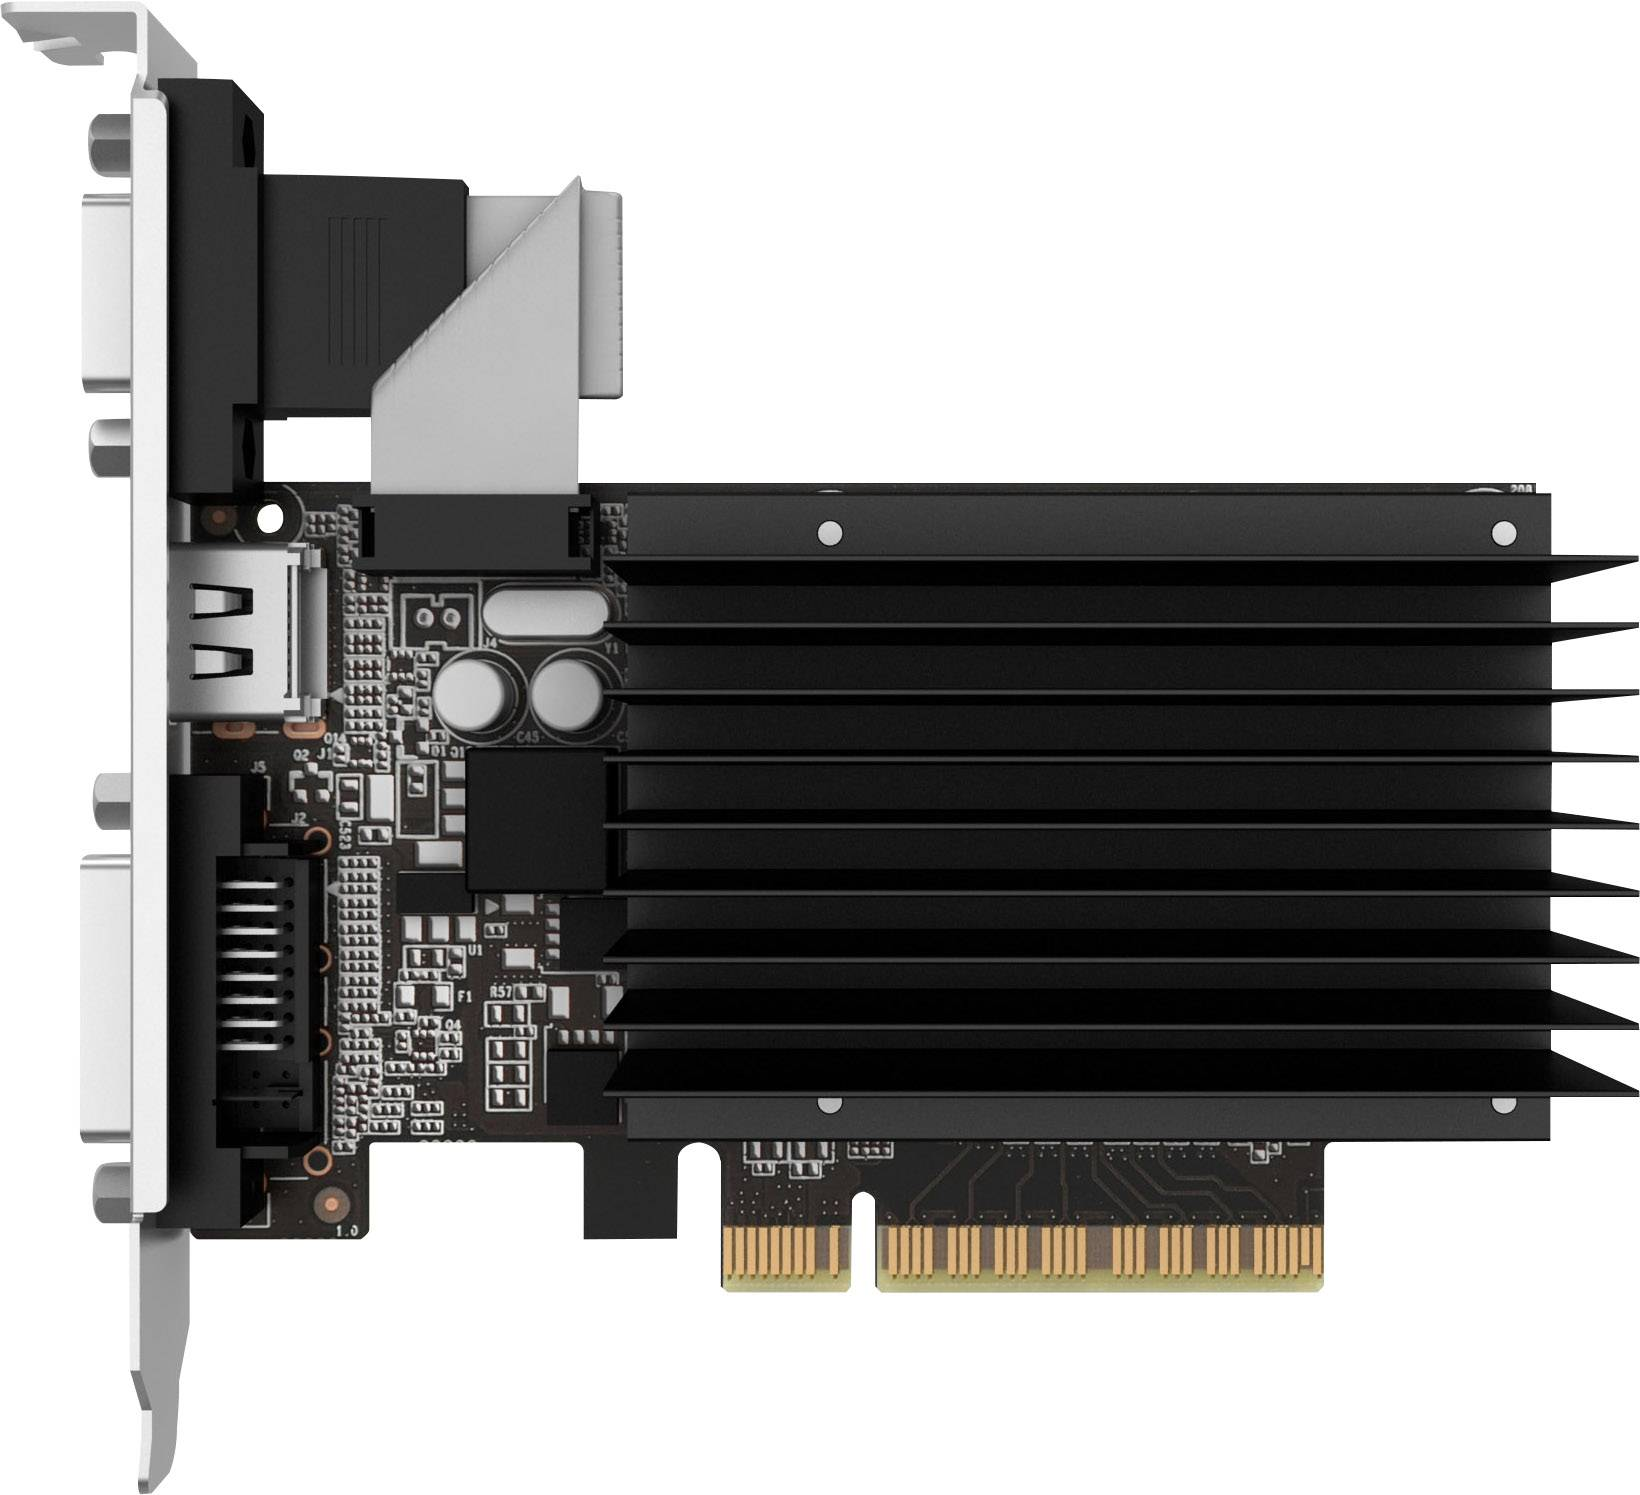 Nero Gainward VGA GT710 Scheda Grafica da 2GB